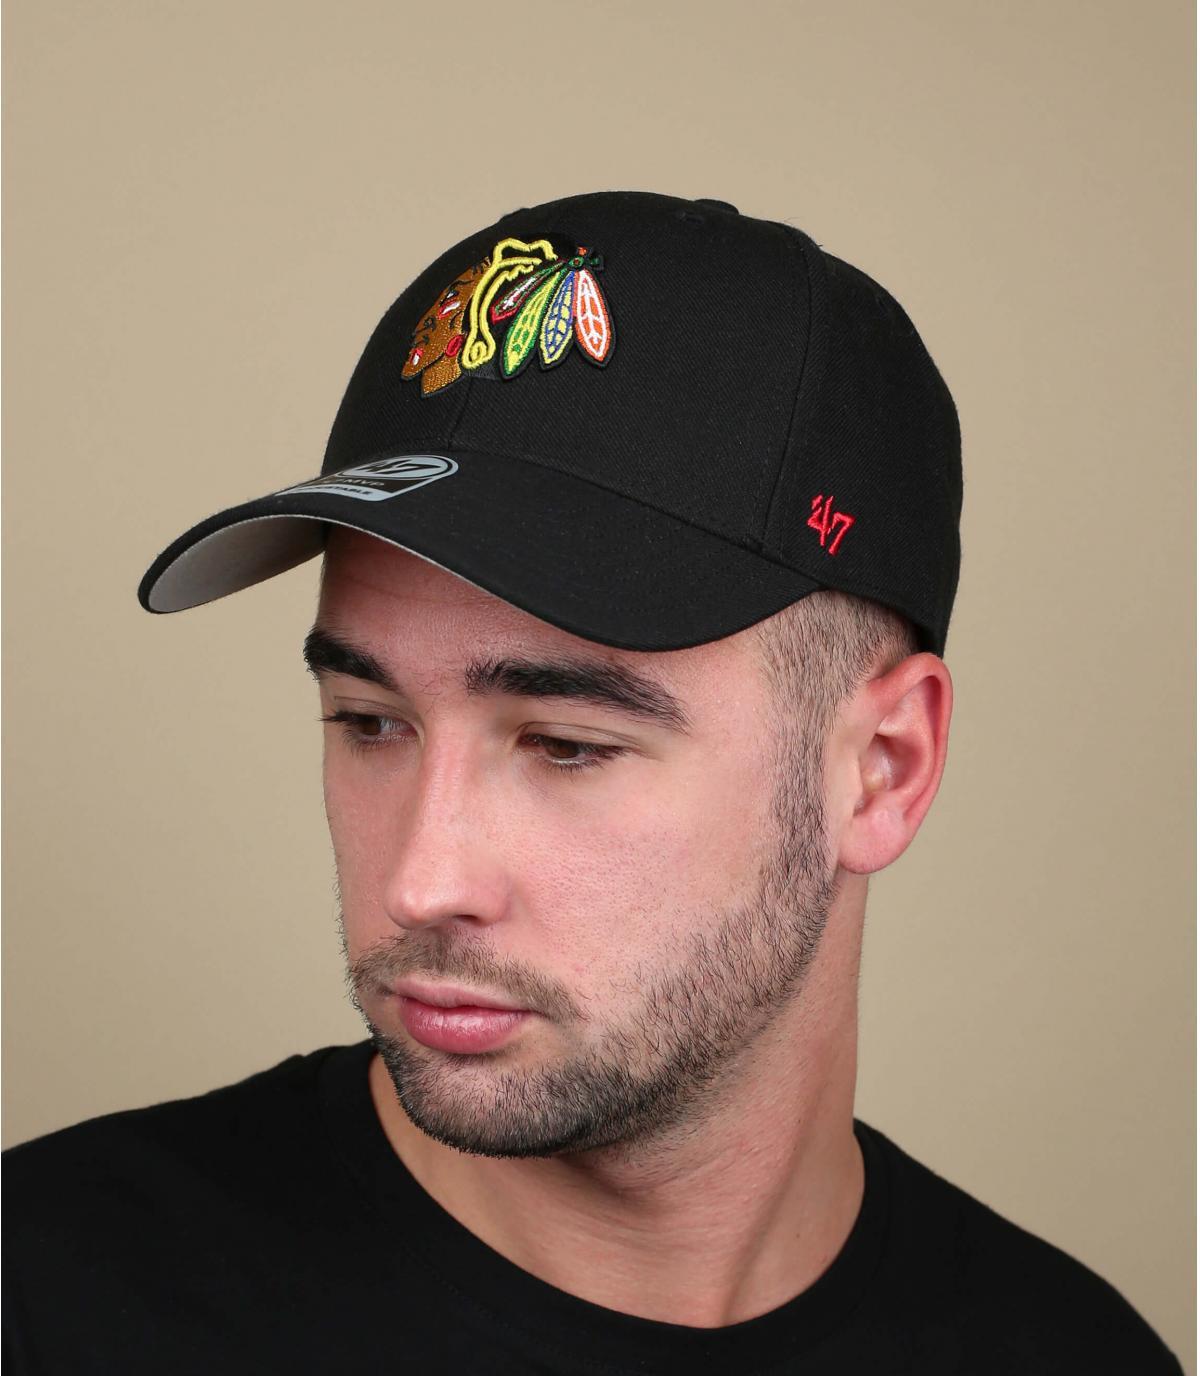 black Blackhawks cap